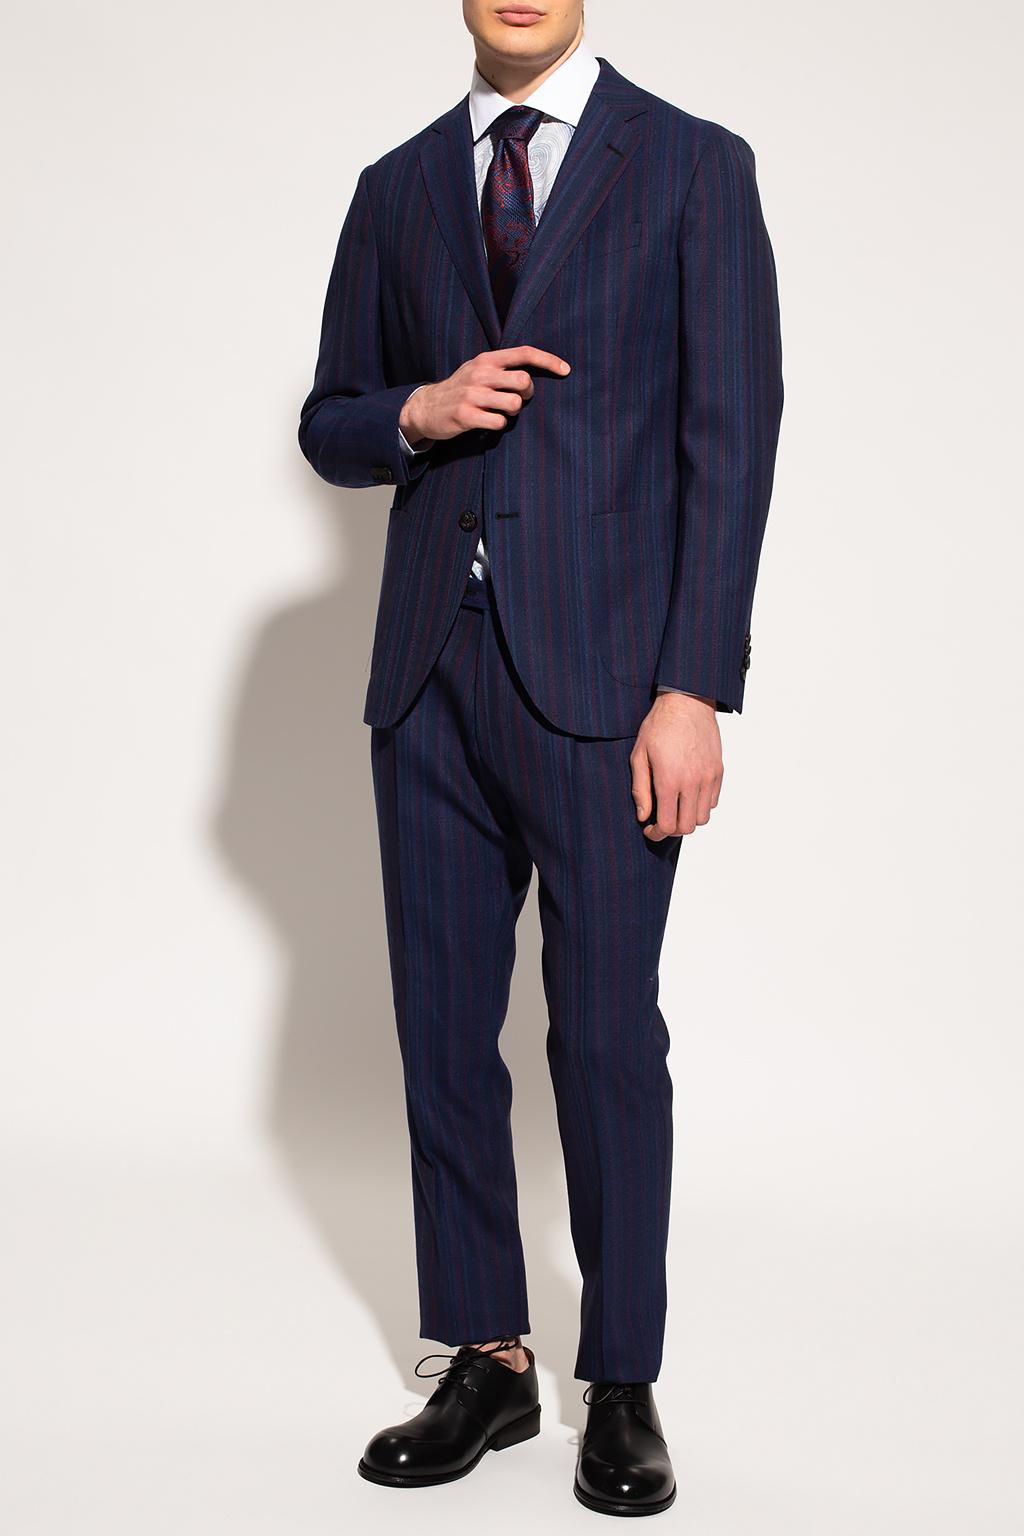 Etro Pinstriped suit